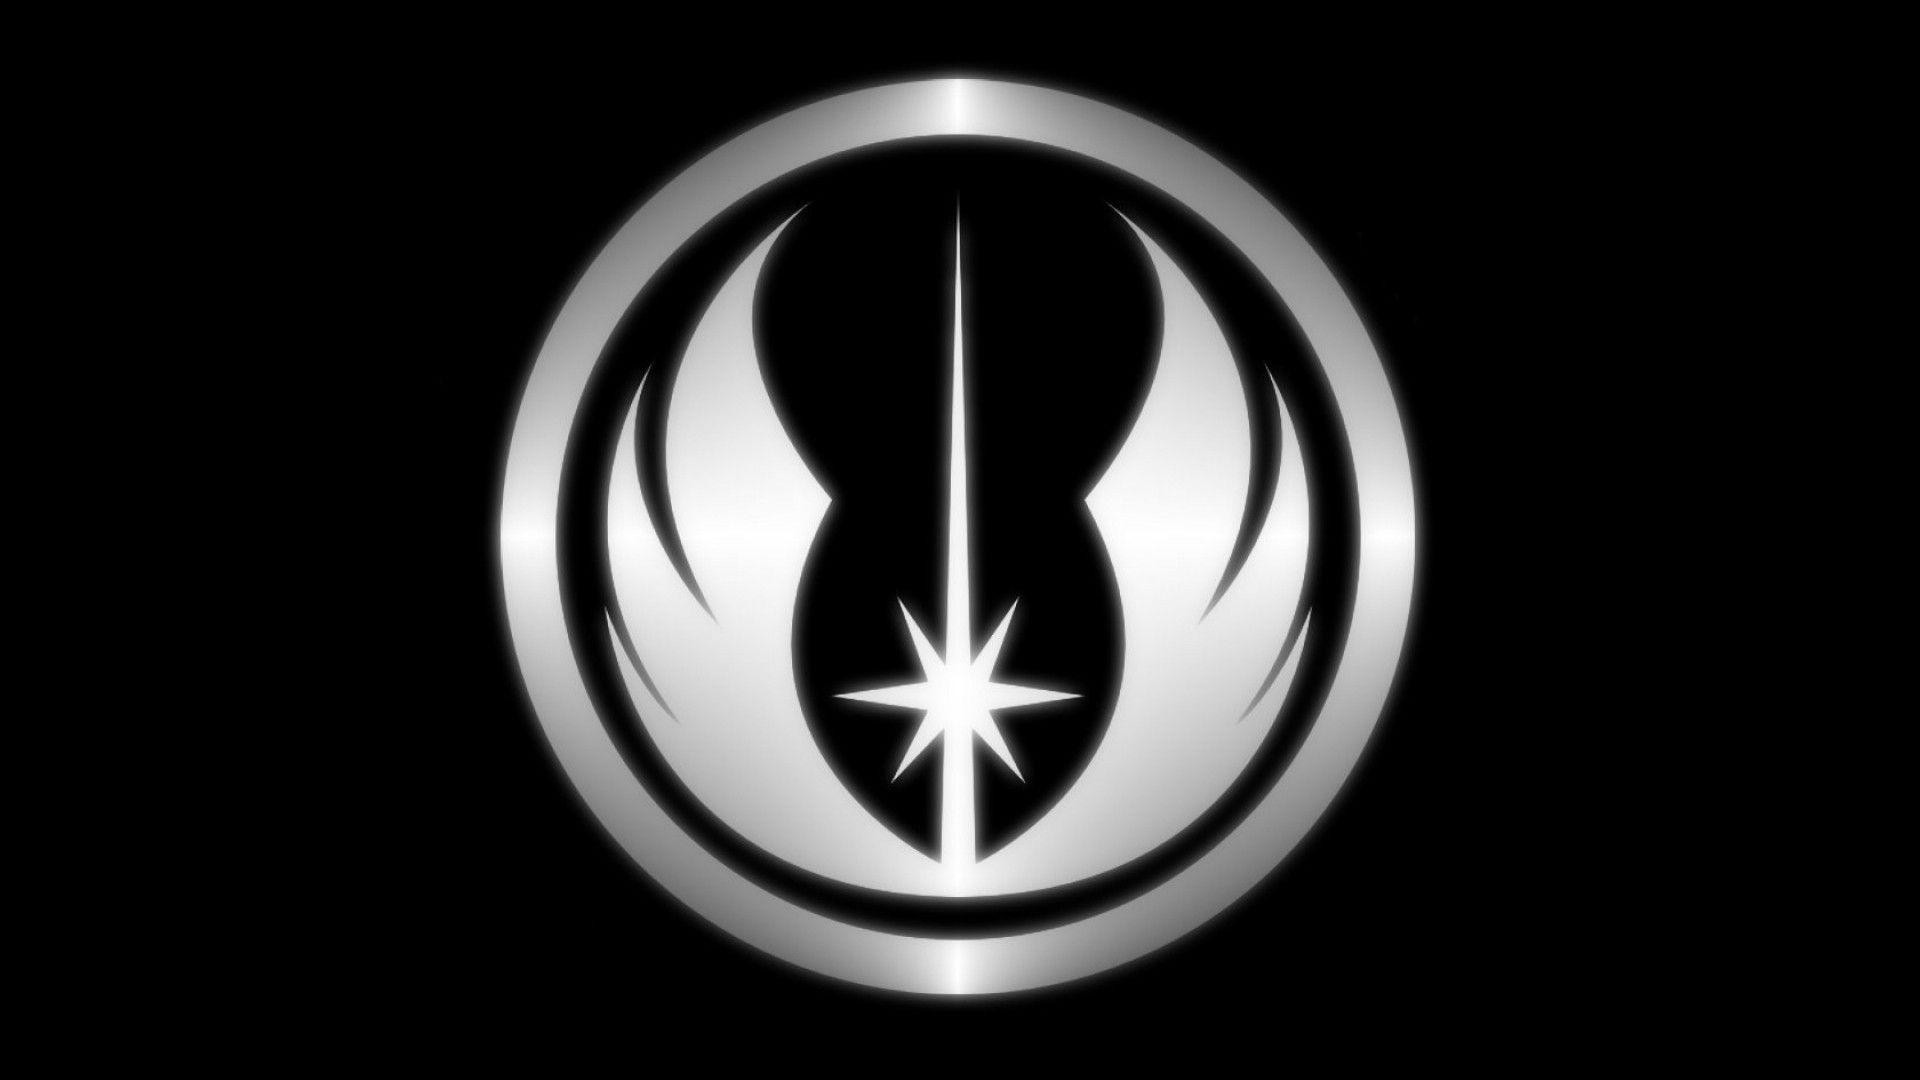 Res: 1920x1080, Live Jedi Symbol Images : Jedi Symbol Wallpapers Collection